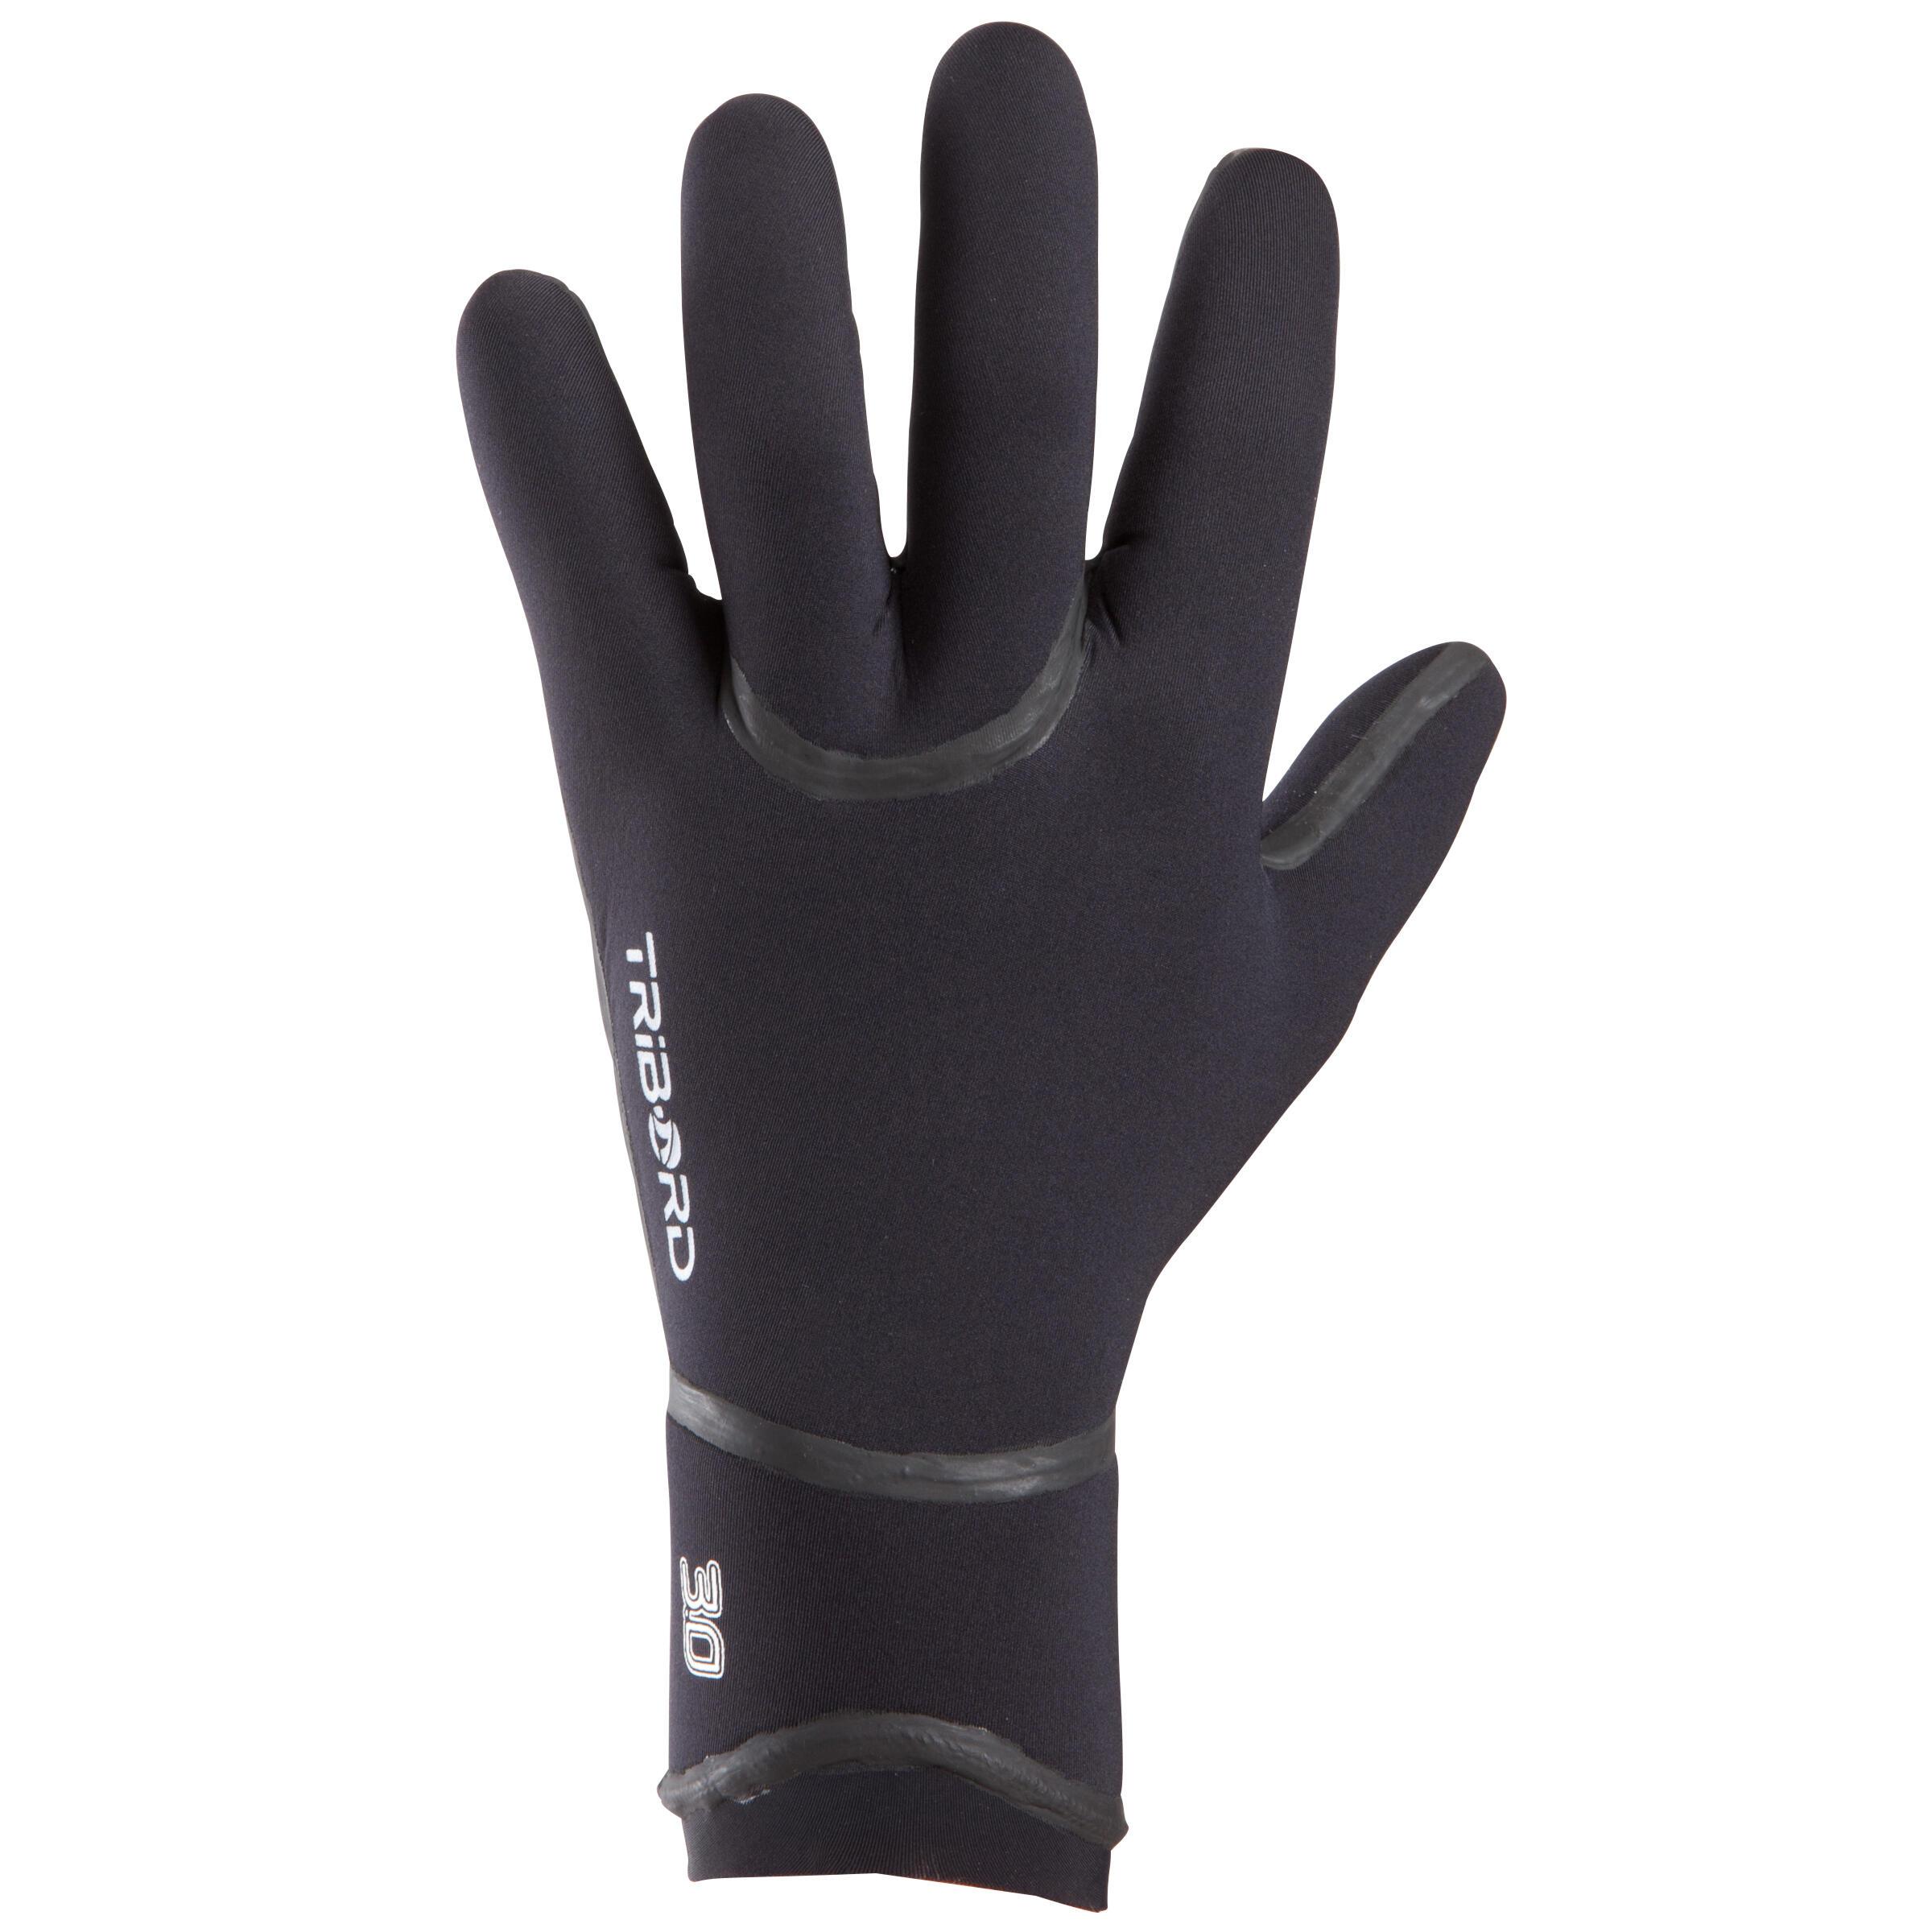 Mănuși Surf Neopren 3 mm